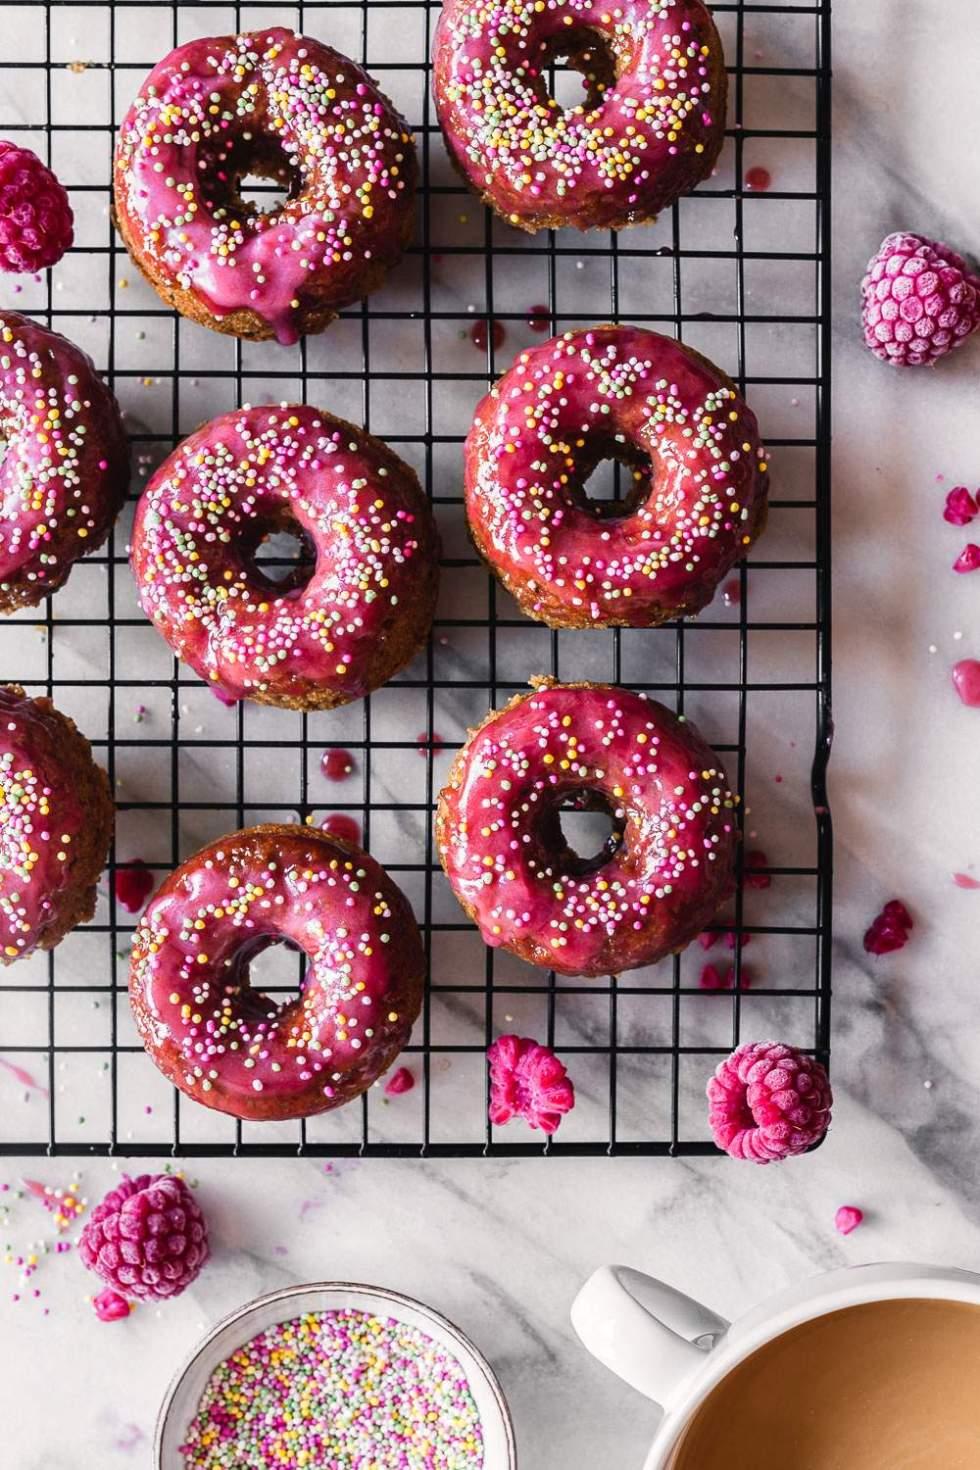 Vegan white chocolate cardamom donuts